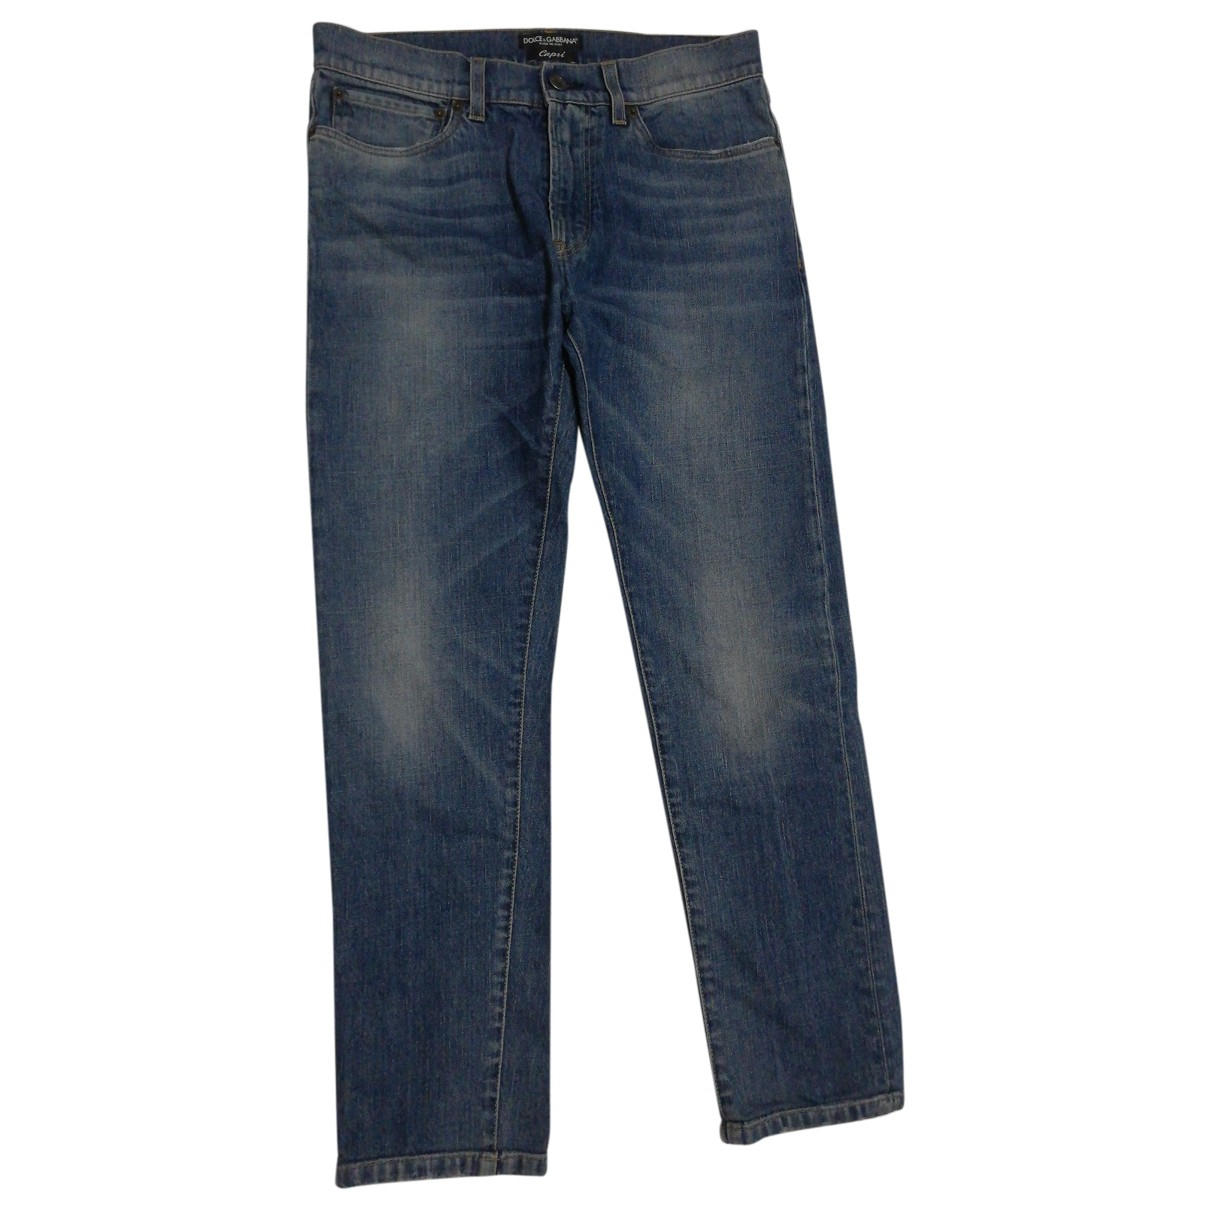 Dolce & Gabbana \N Blue Cotton - elasthane Jeans for Men 42 FR